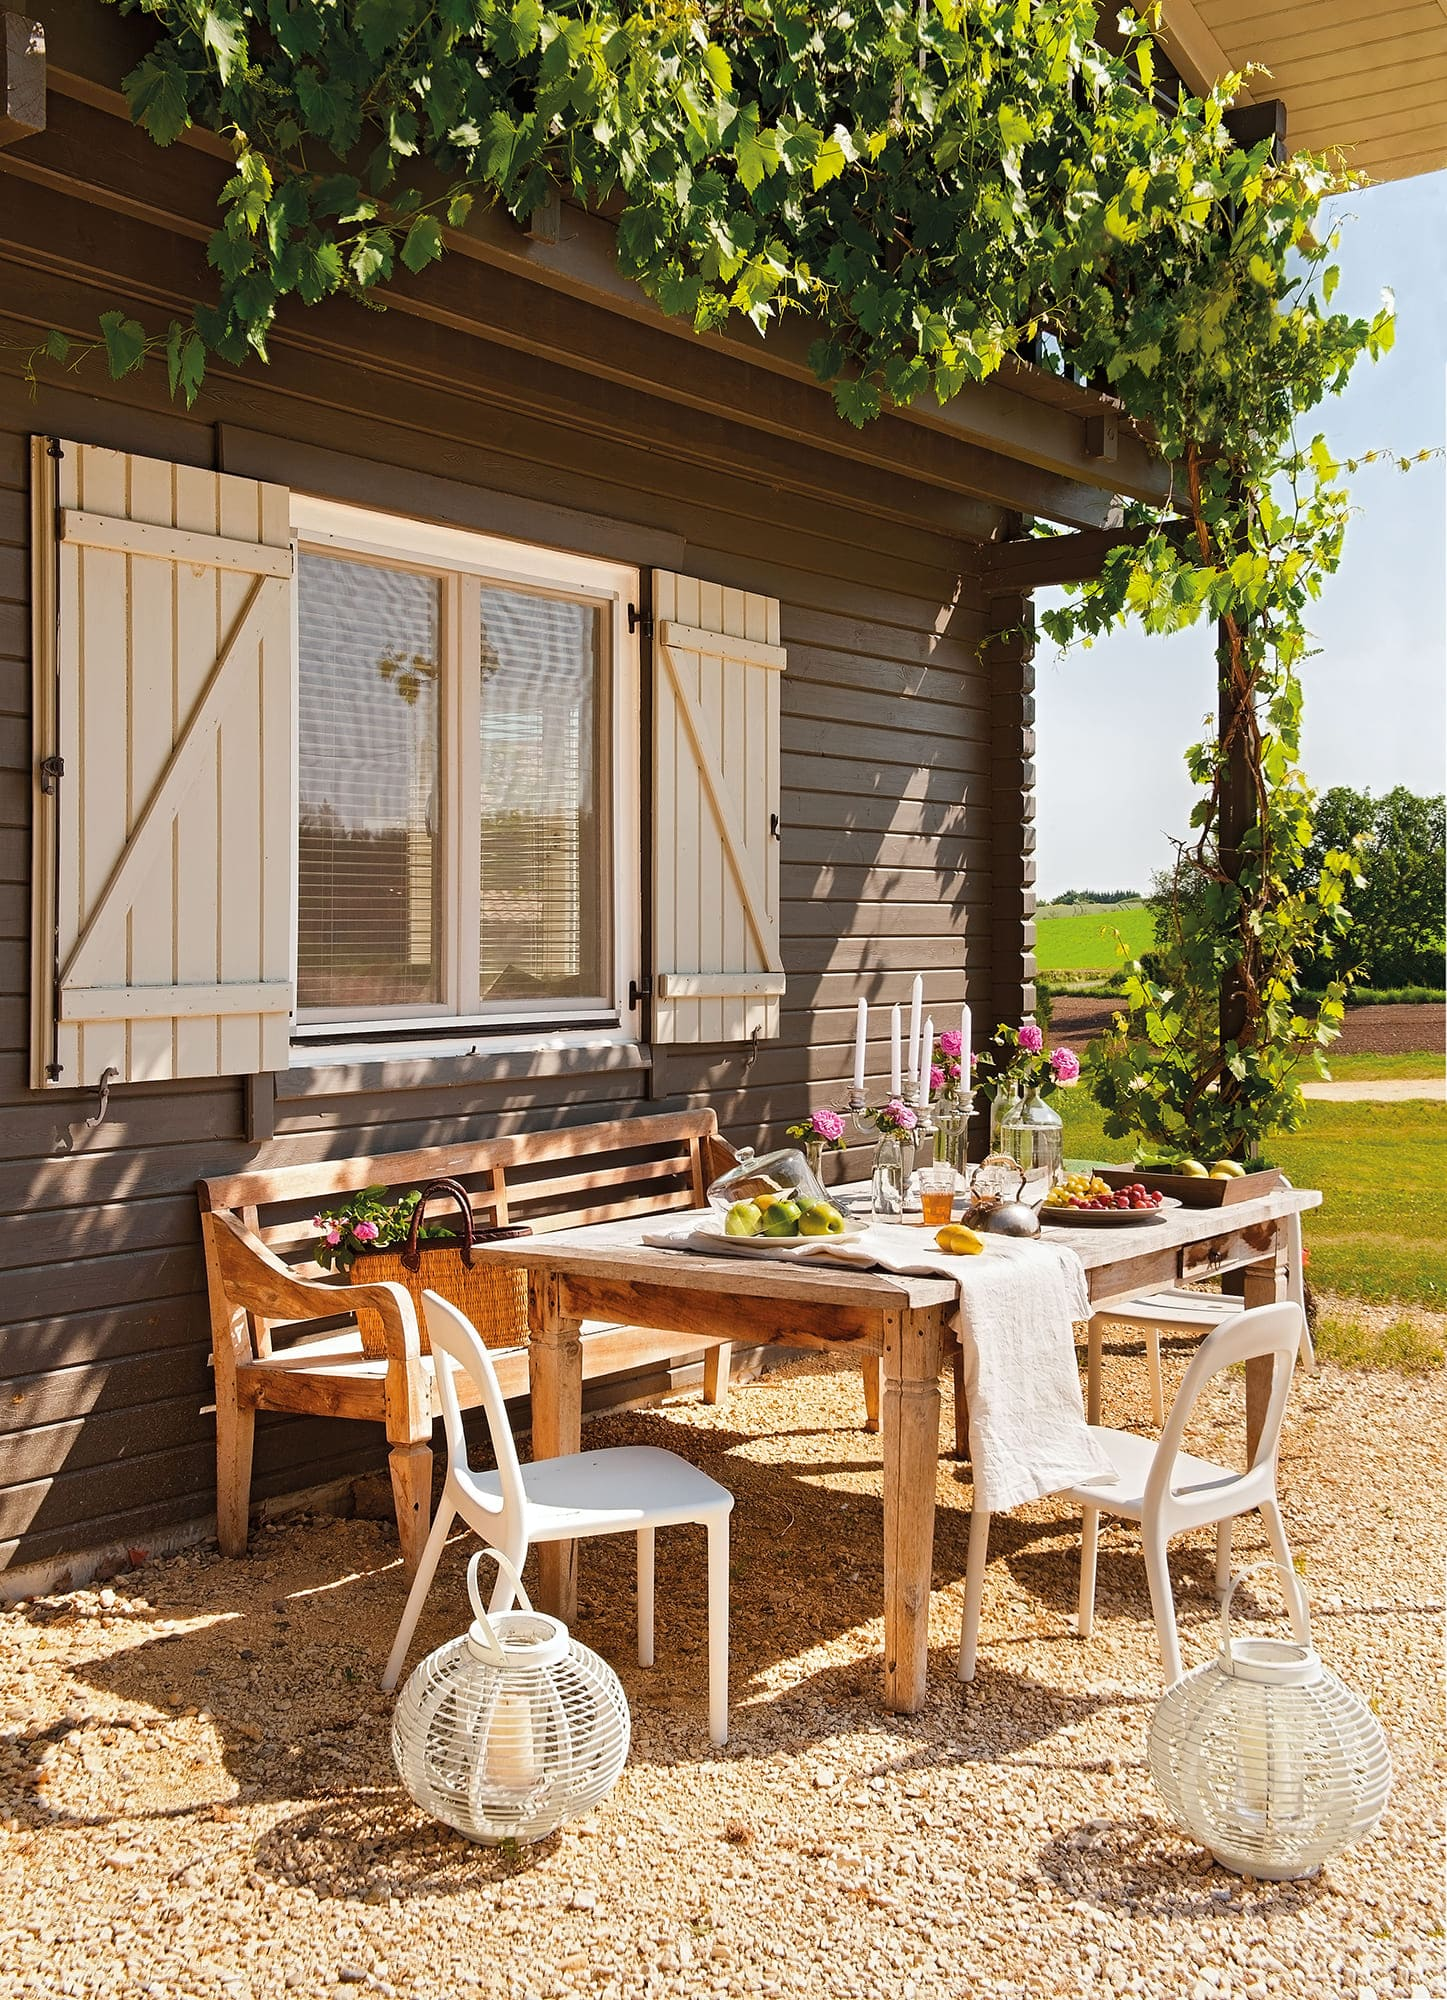 contraventana exterior de casa rustica con zona de comer